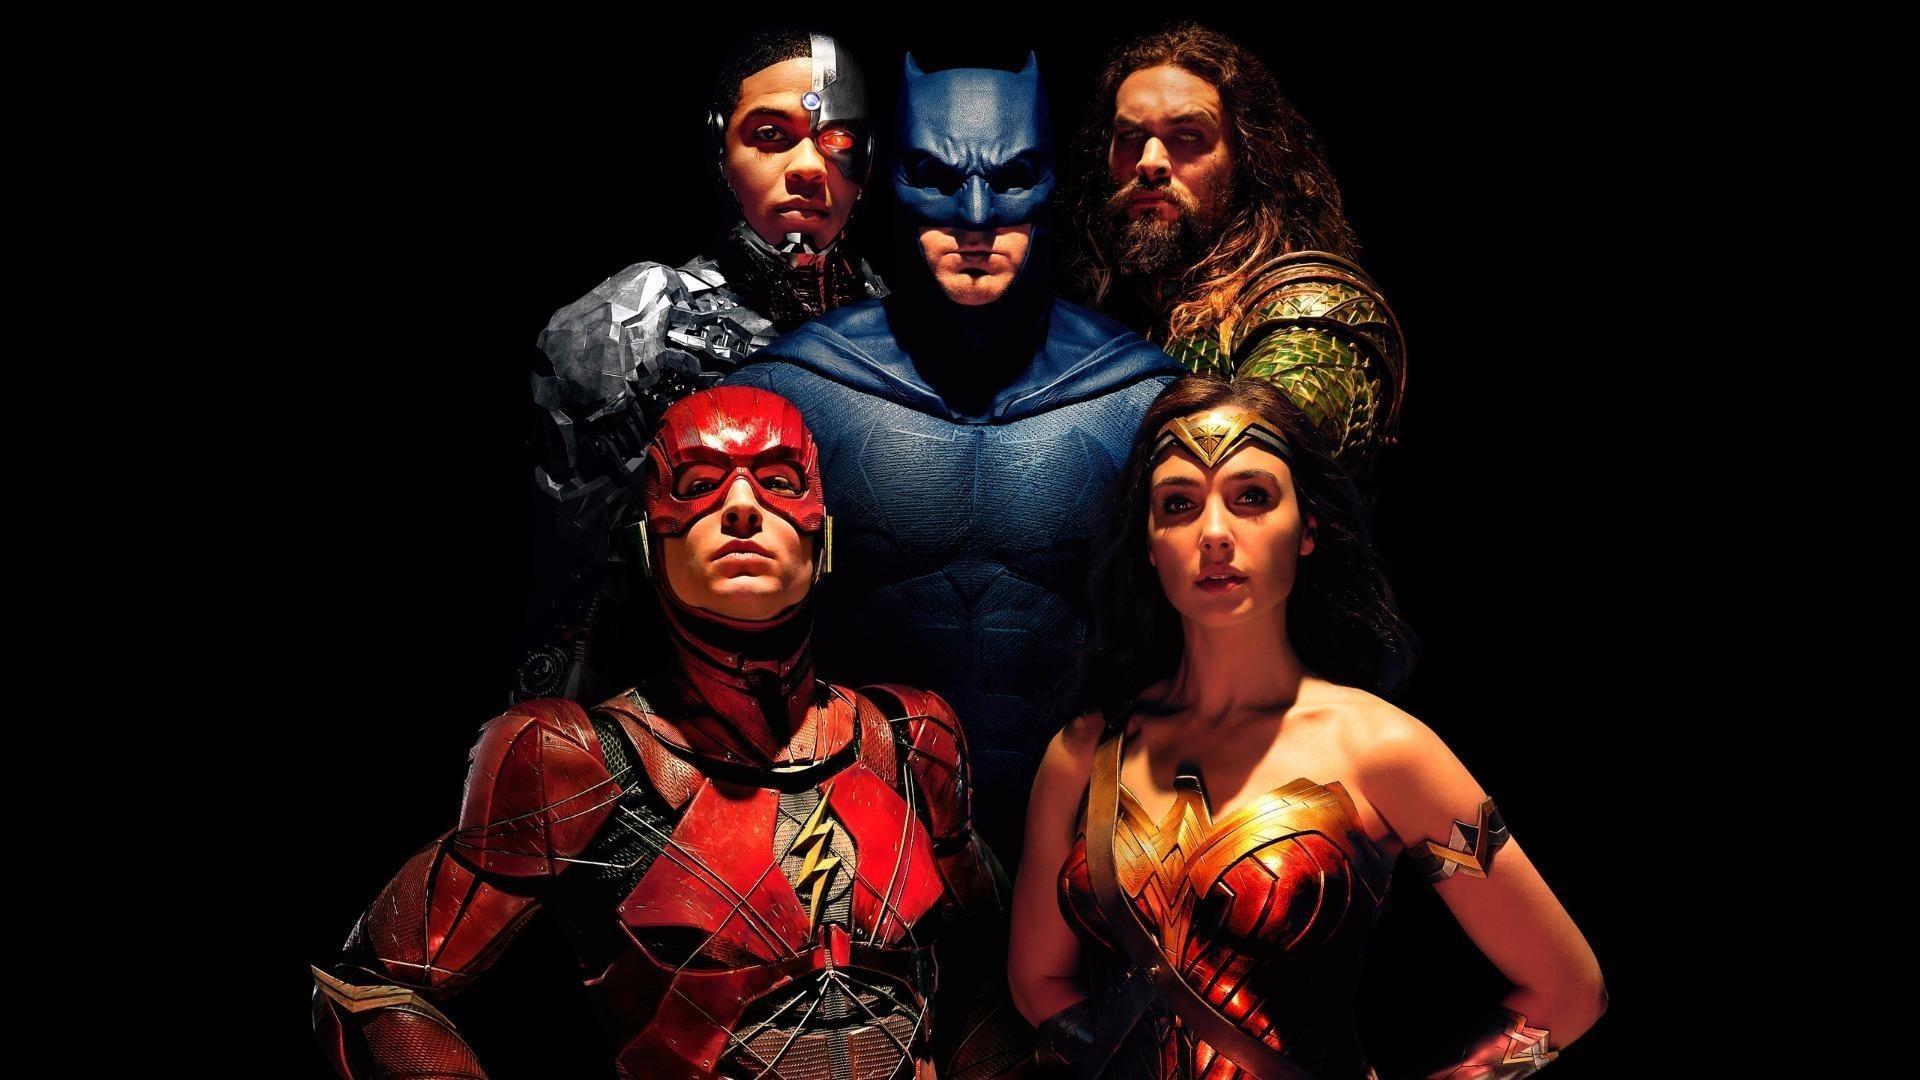 Justice League Poster Desktop Wallpaper